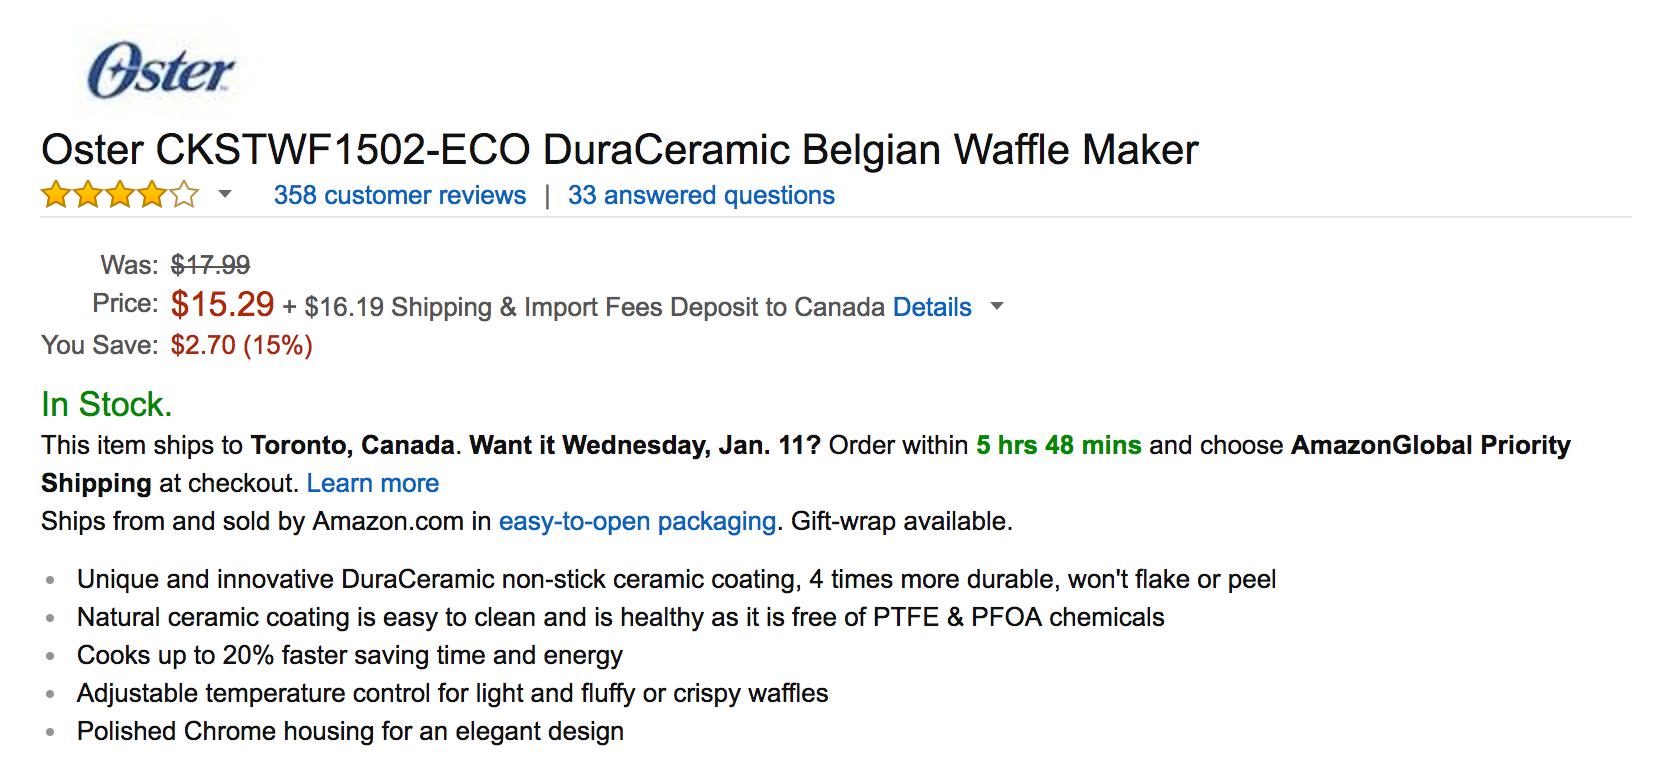 oster-duraceramic-belgian-waffle-maker-ckstwf1502-eco-2